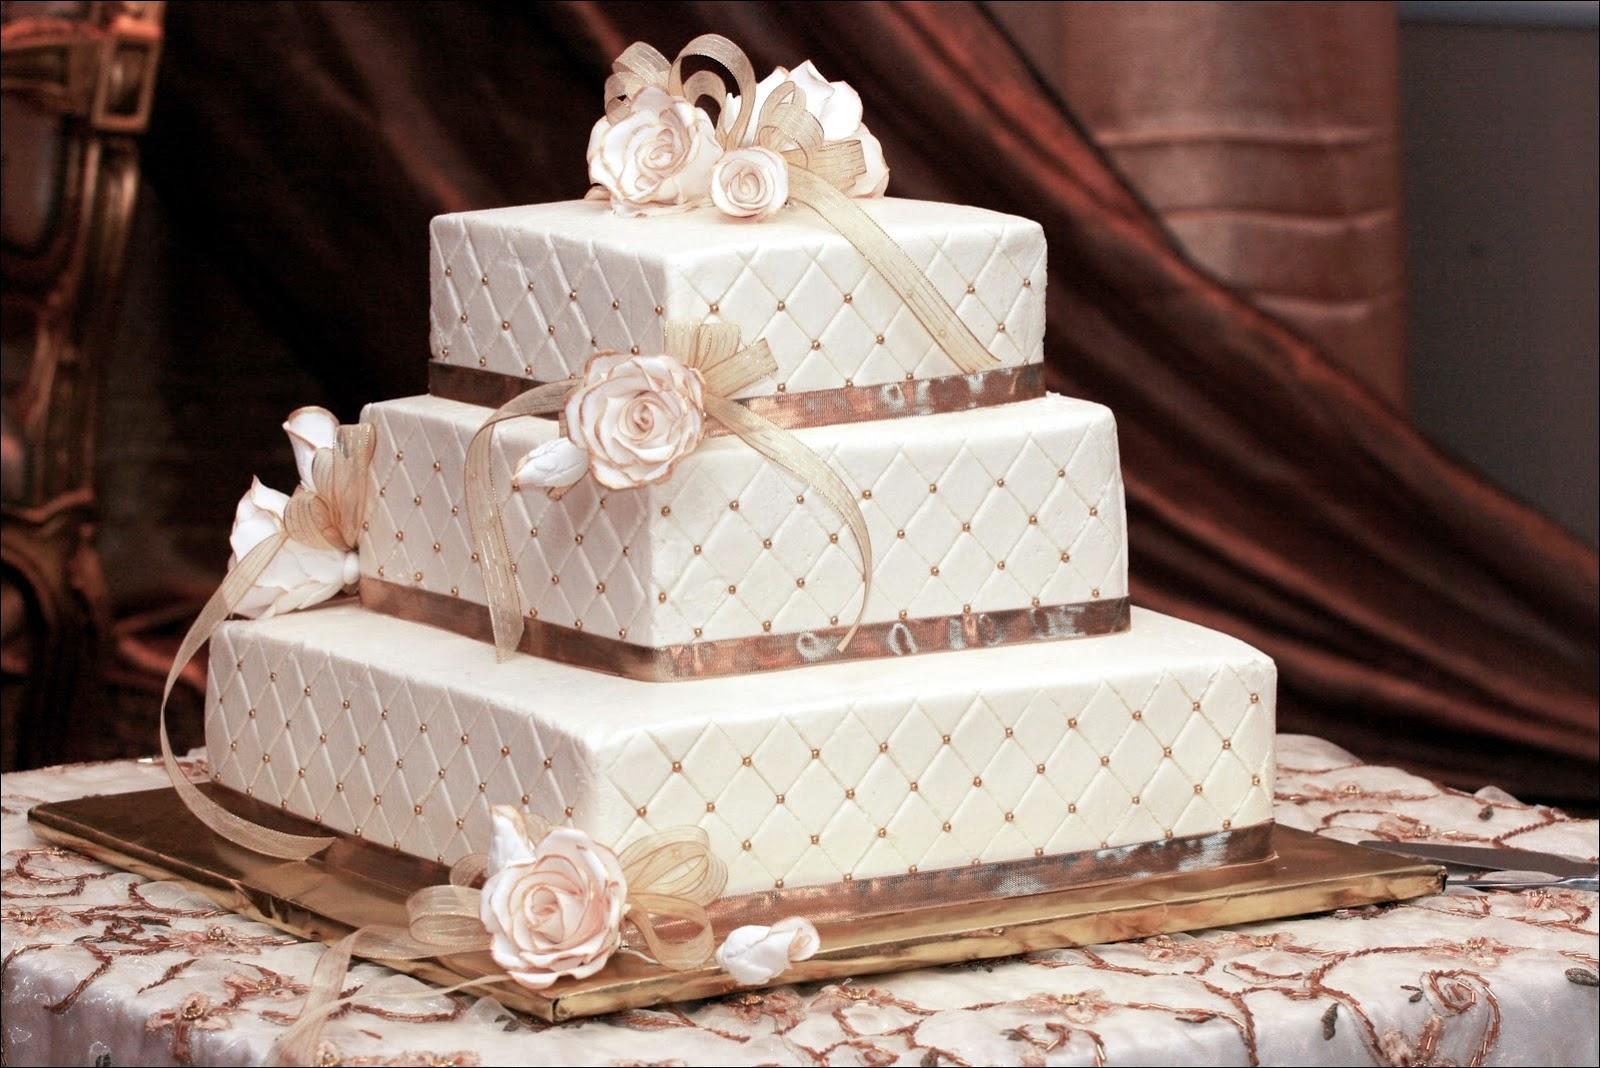 waitrose cake prices all cake prices. Black Bedroom Furniture Sets. Home Design Ideas